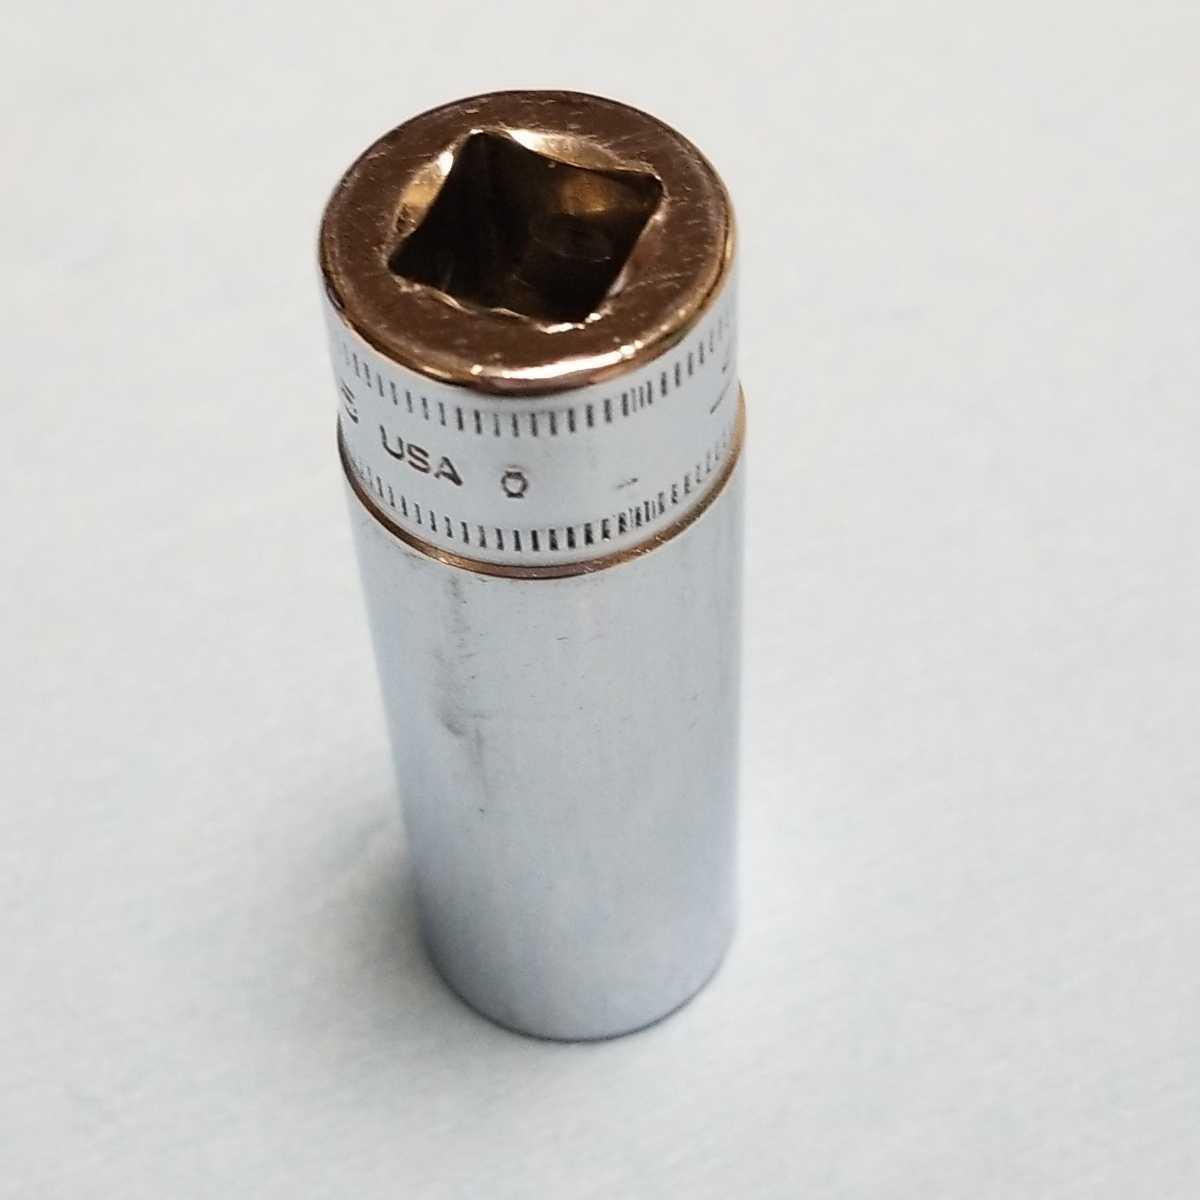 15mm 3/8 ディープ スナップオン SFM15 (12角) 中古品 保管品 SNAPON SNAP-ON ディープソケット ソケット 送料無料 _画像2